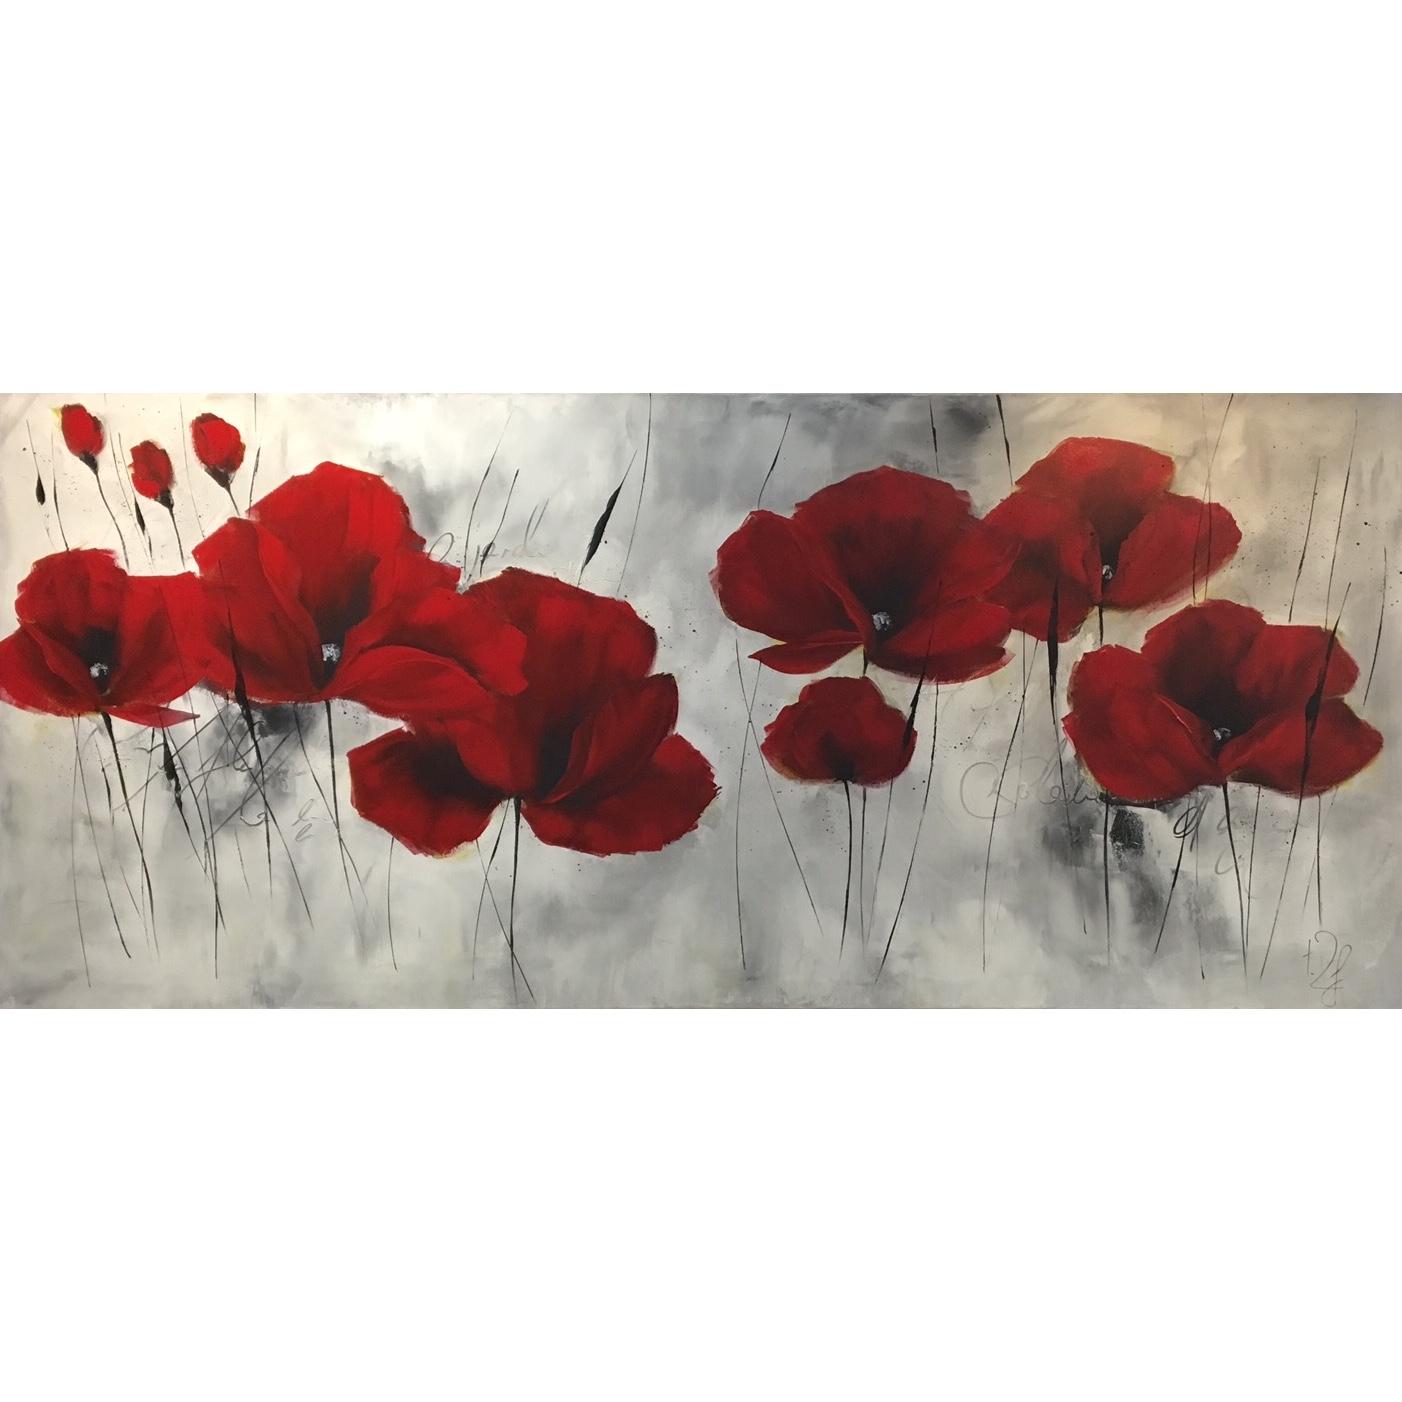 Isabelle Zacher-Finet schilderij 'Klaprozen'